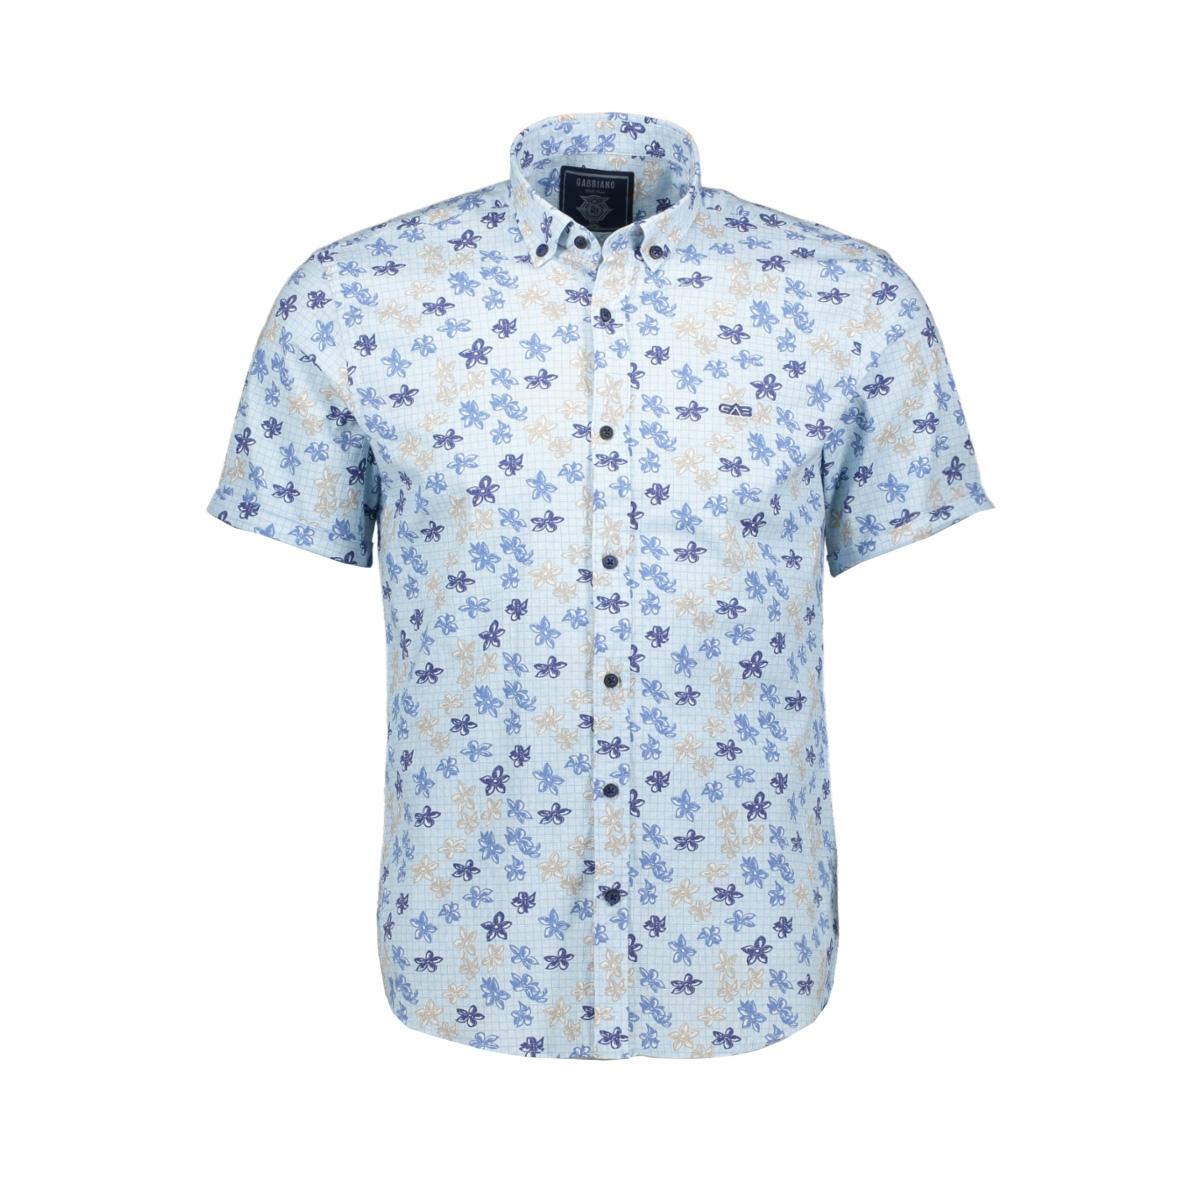 shirt 33780 gabbiano overhemd v1/blue